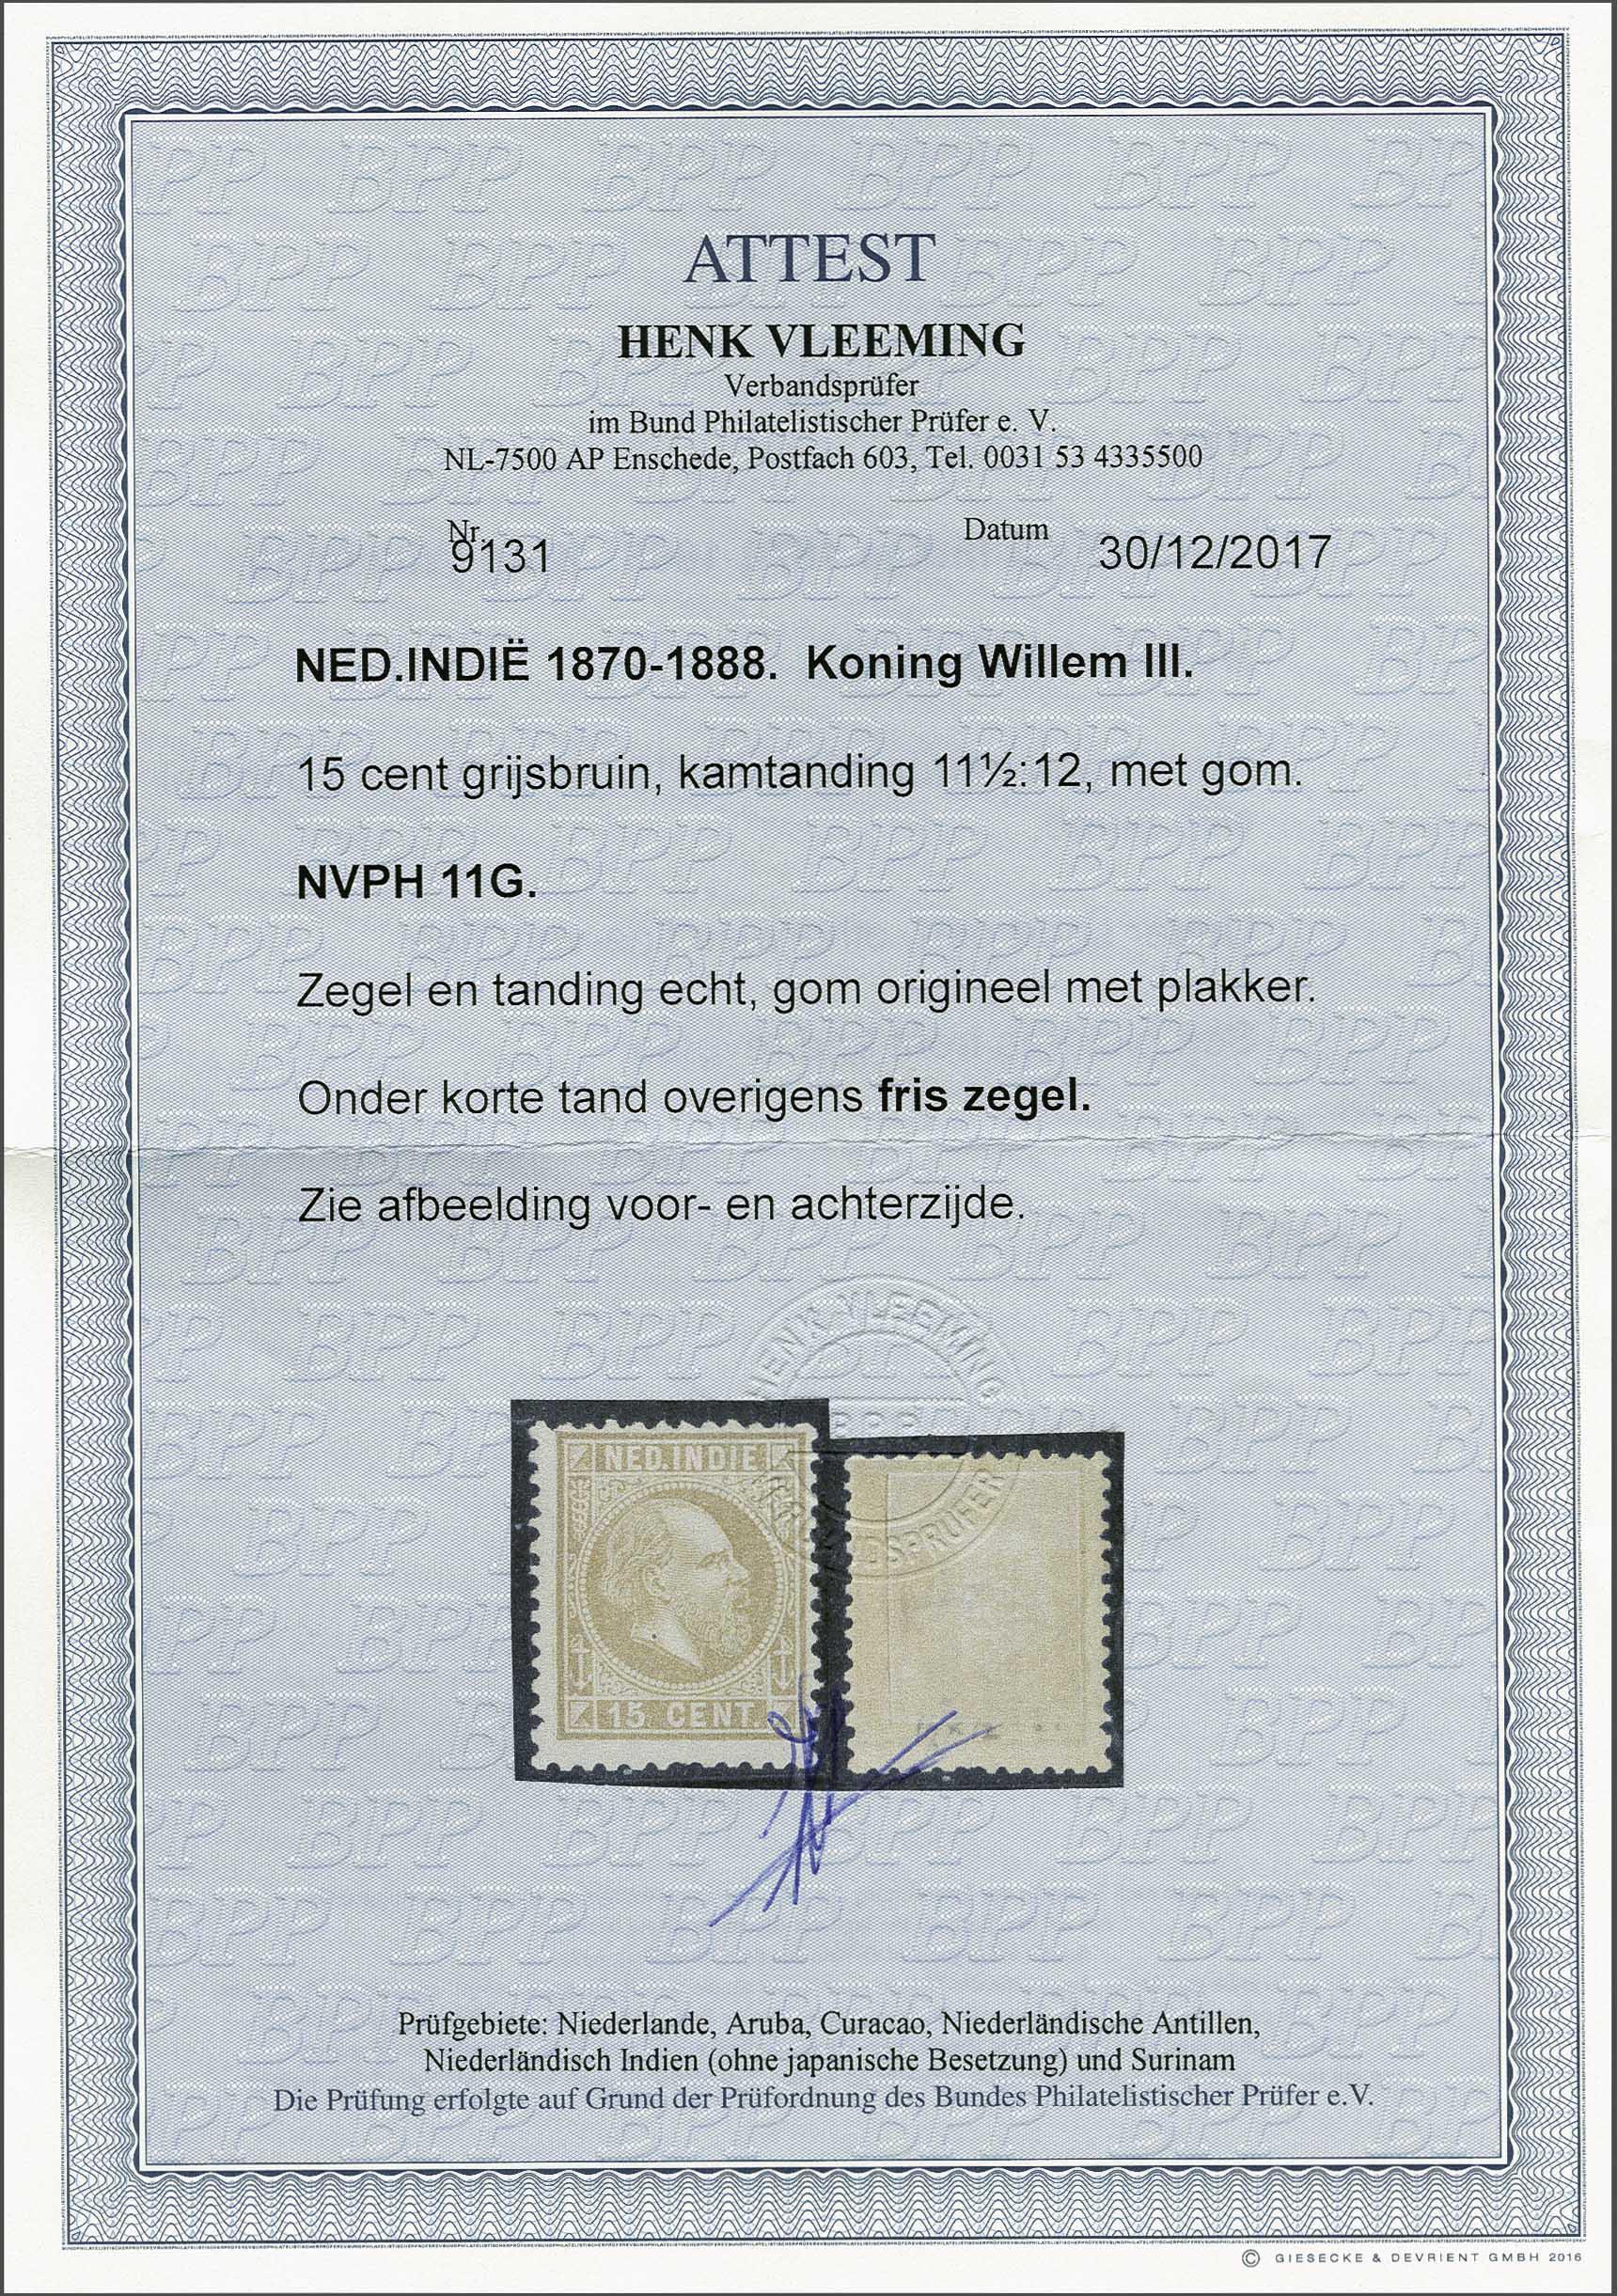 Lot 17 - Netherlands and Former Territories dutch east indies -  Corinphila veilingen Auction 236: Netherlands Colonies - The J.F. de Beaufort collection